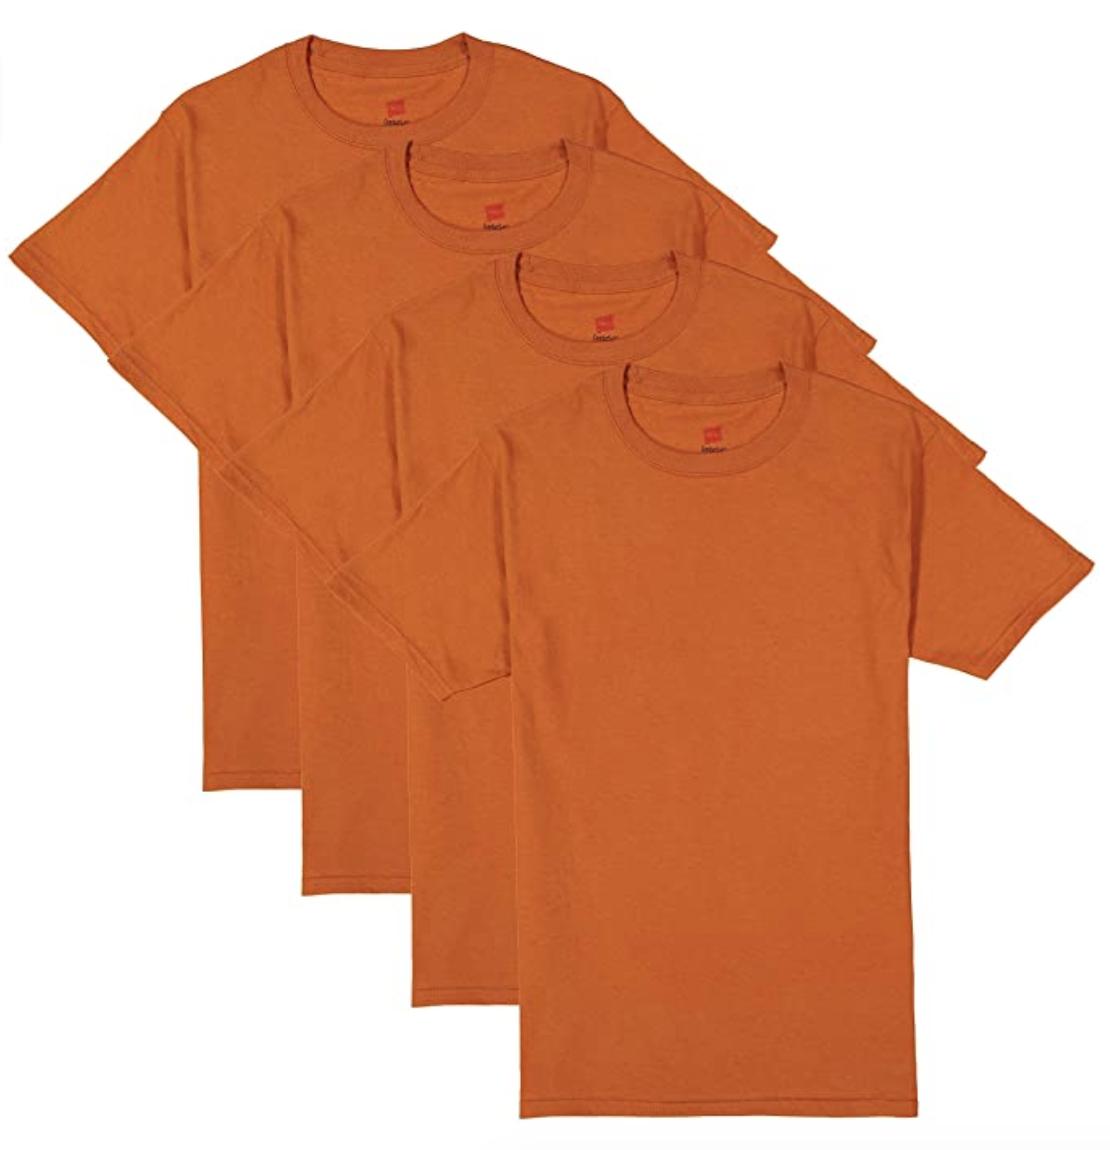 orange t-shirts